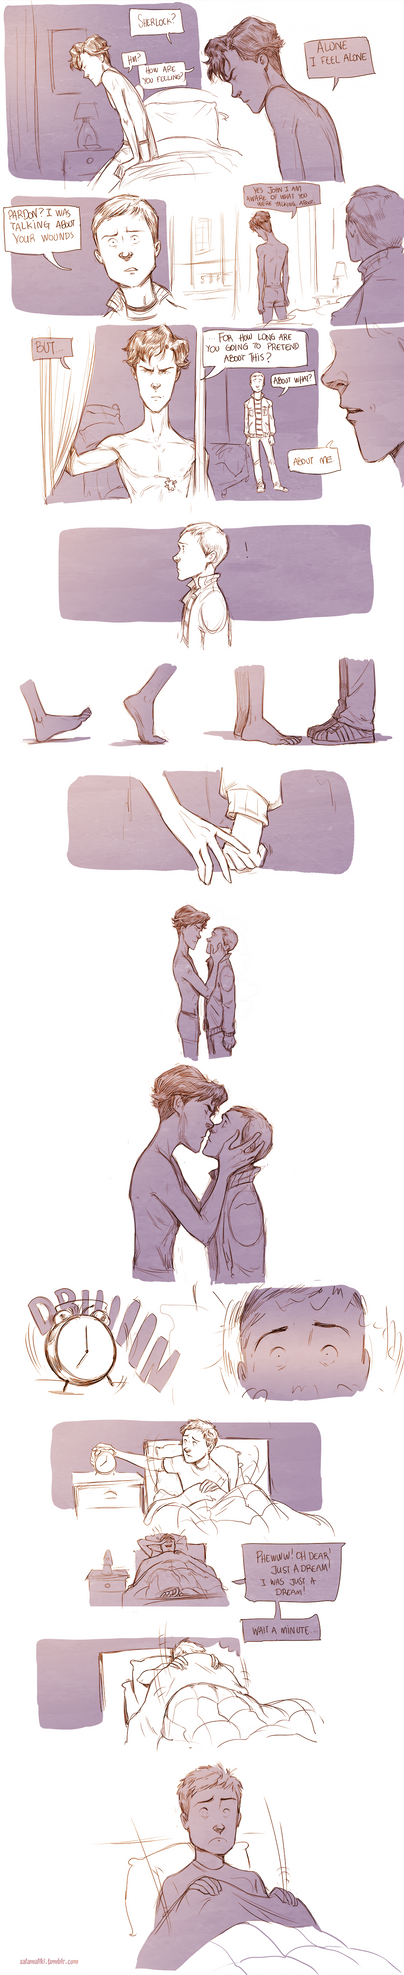 Teen Sherlock - Forbidden Friendship by DrSlug